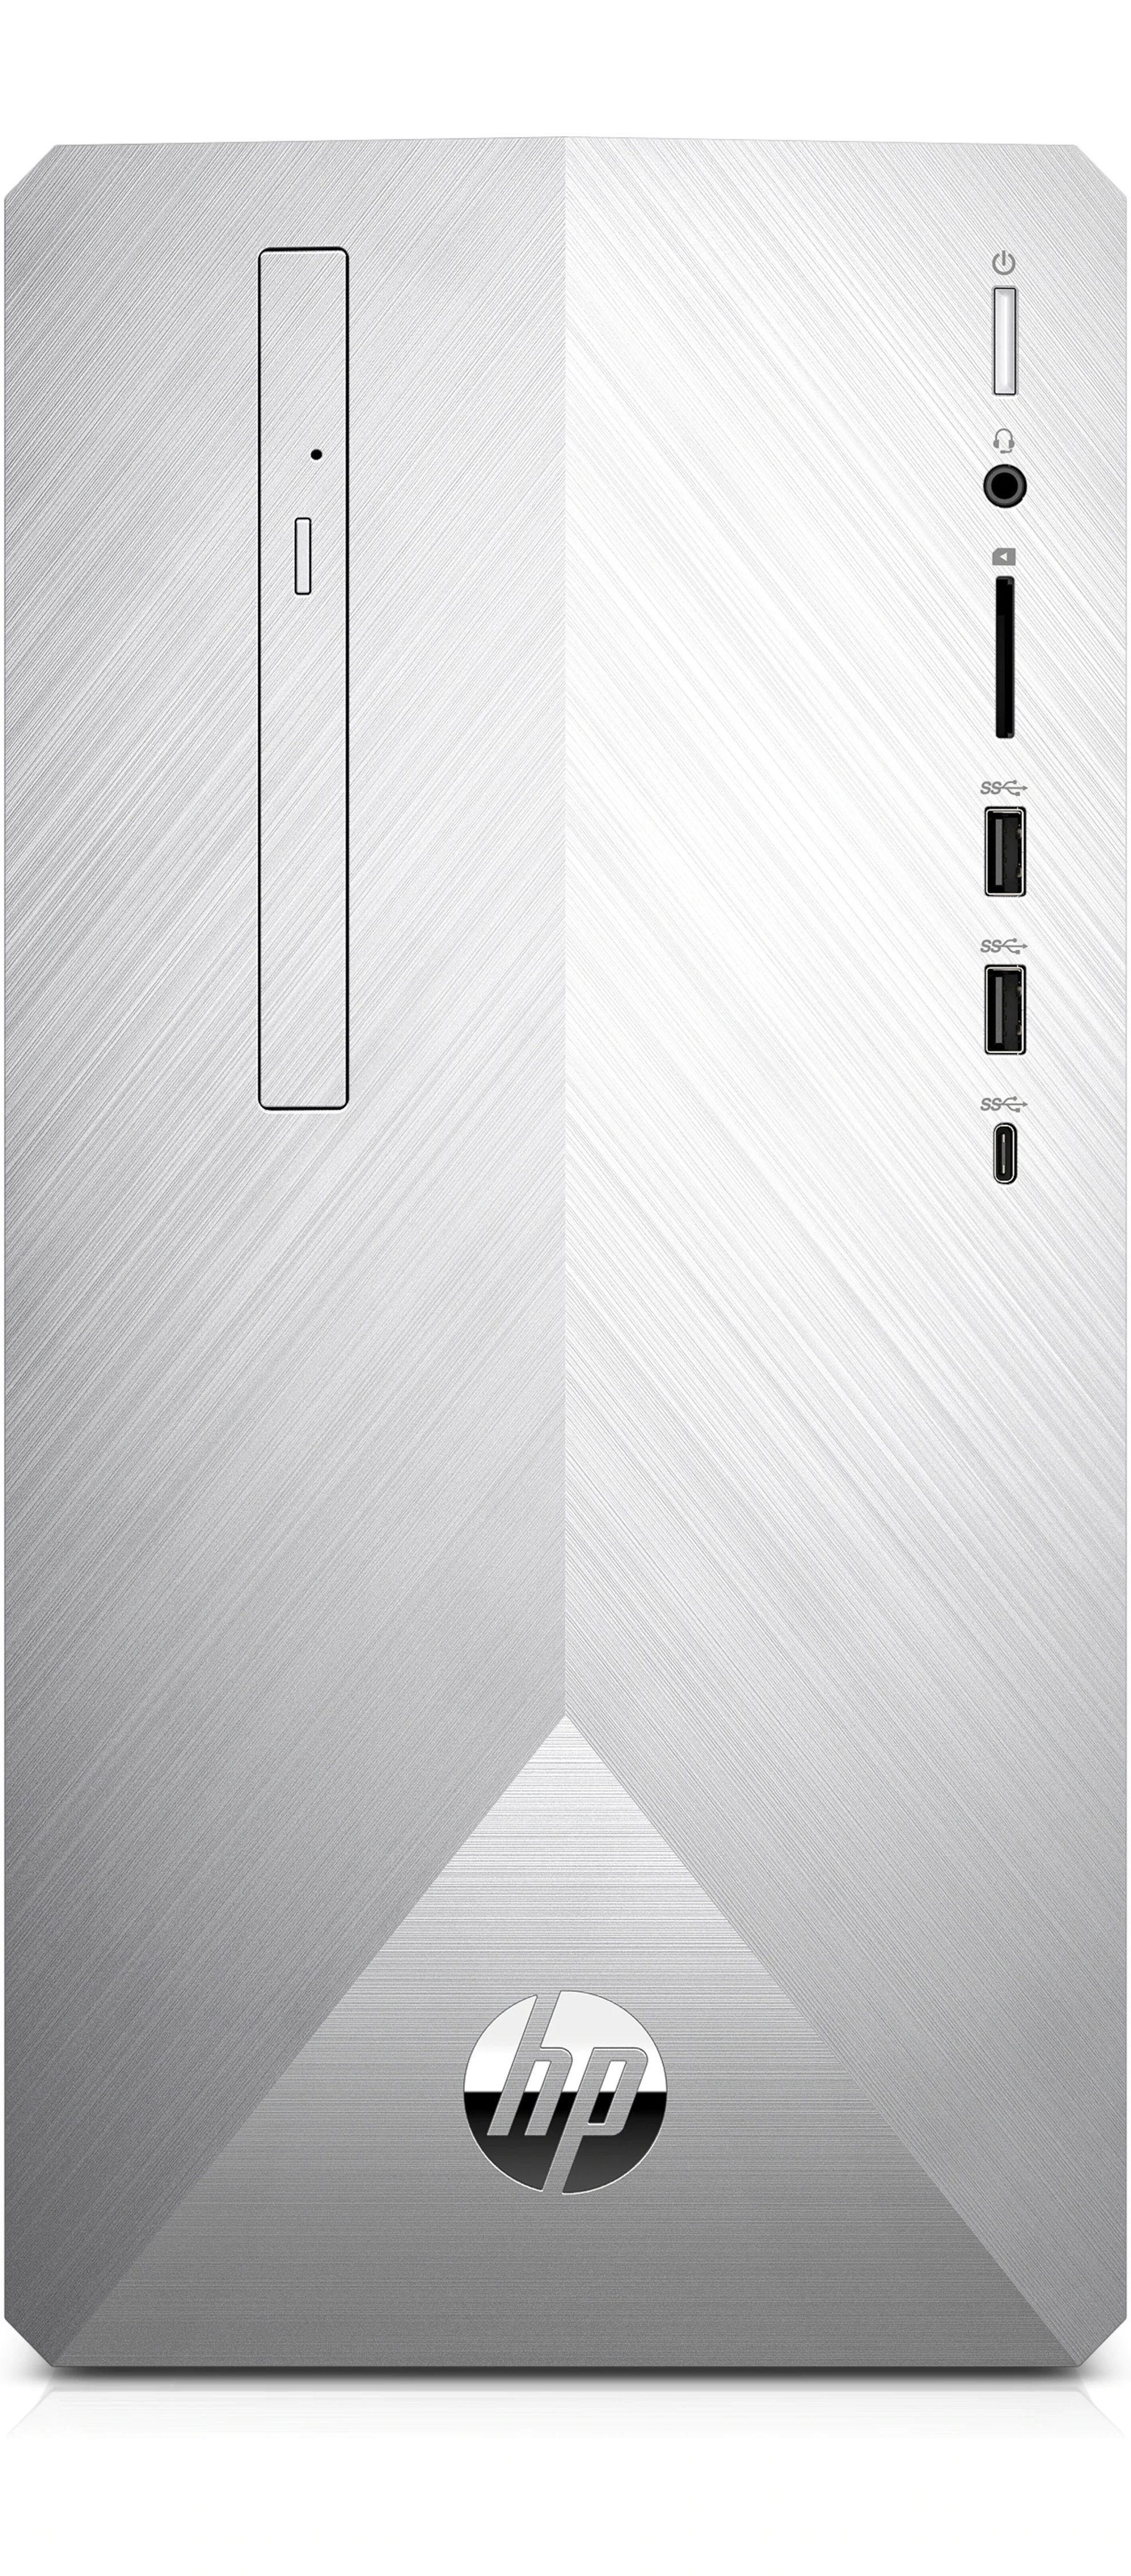 HP Pavilion 595-p0500ng Desktop PC »Intel Core i5, 1 TB + 128 GB M.2 SSD, 16 GB«